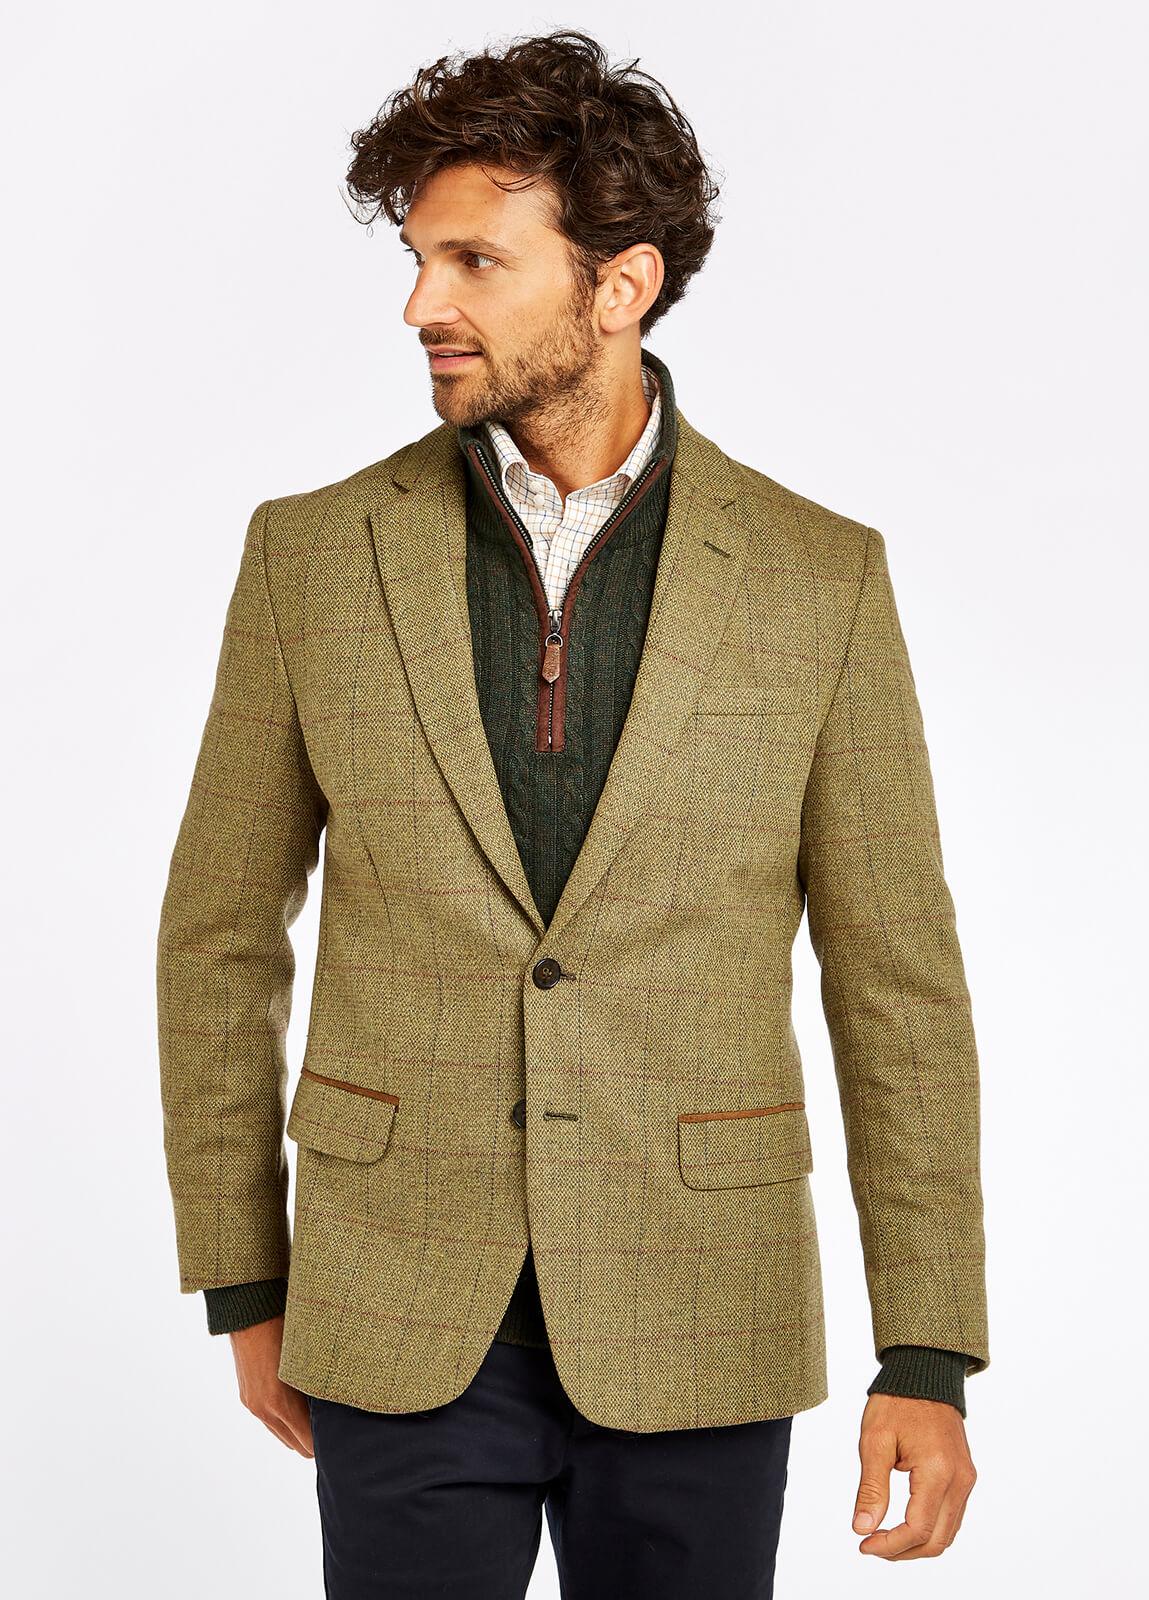 Rockville Tweed Jacket - Beechwood